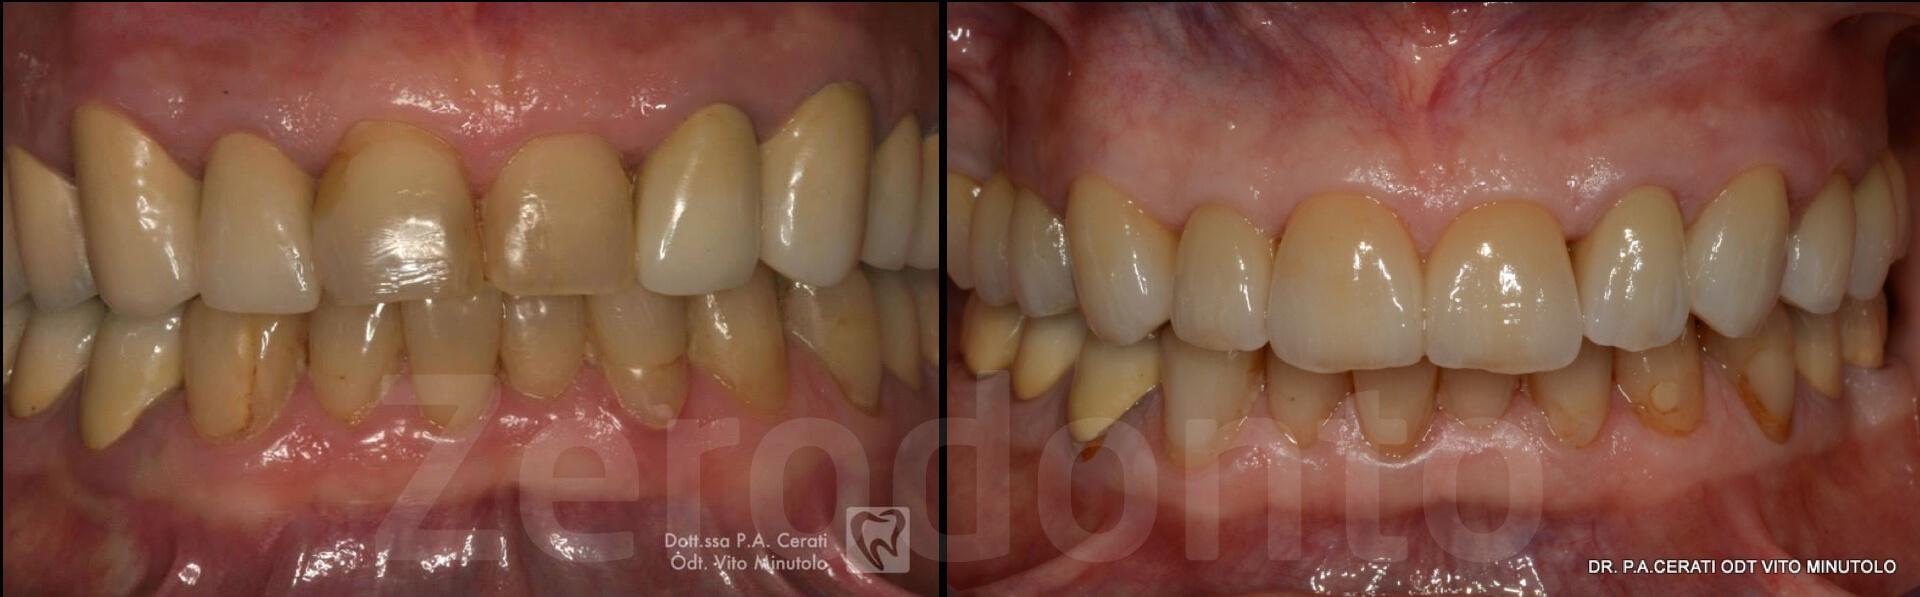 Case 32 | Prosthodontic Award 2015 | Italy